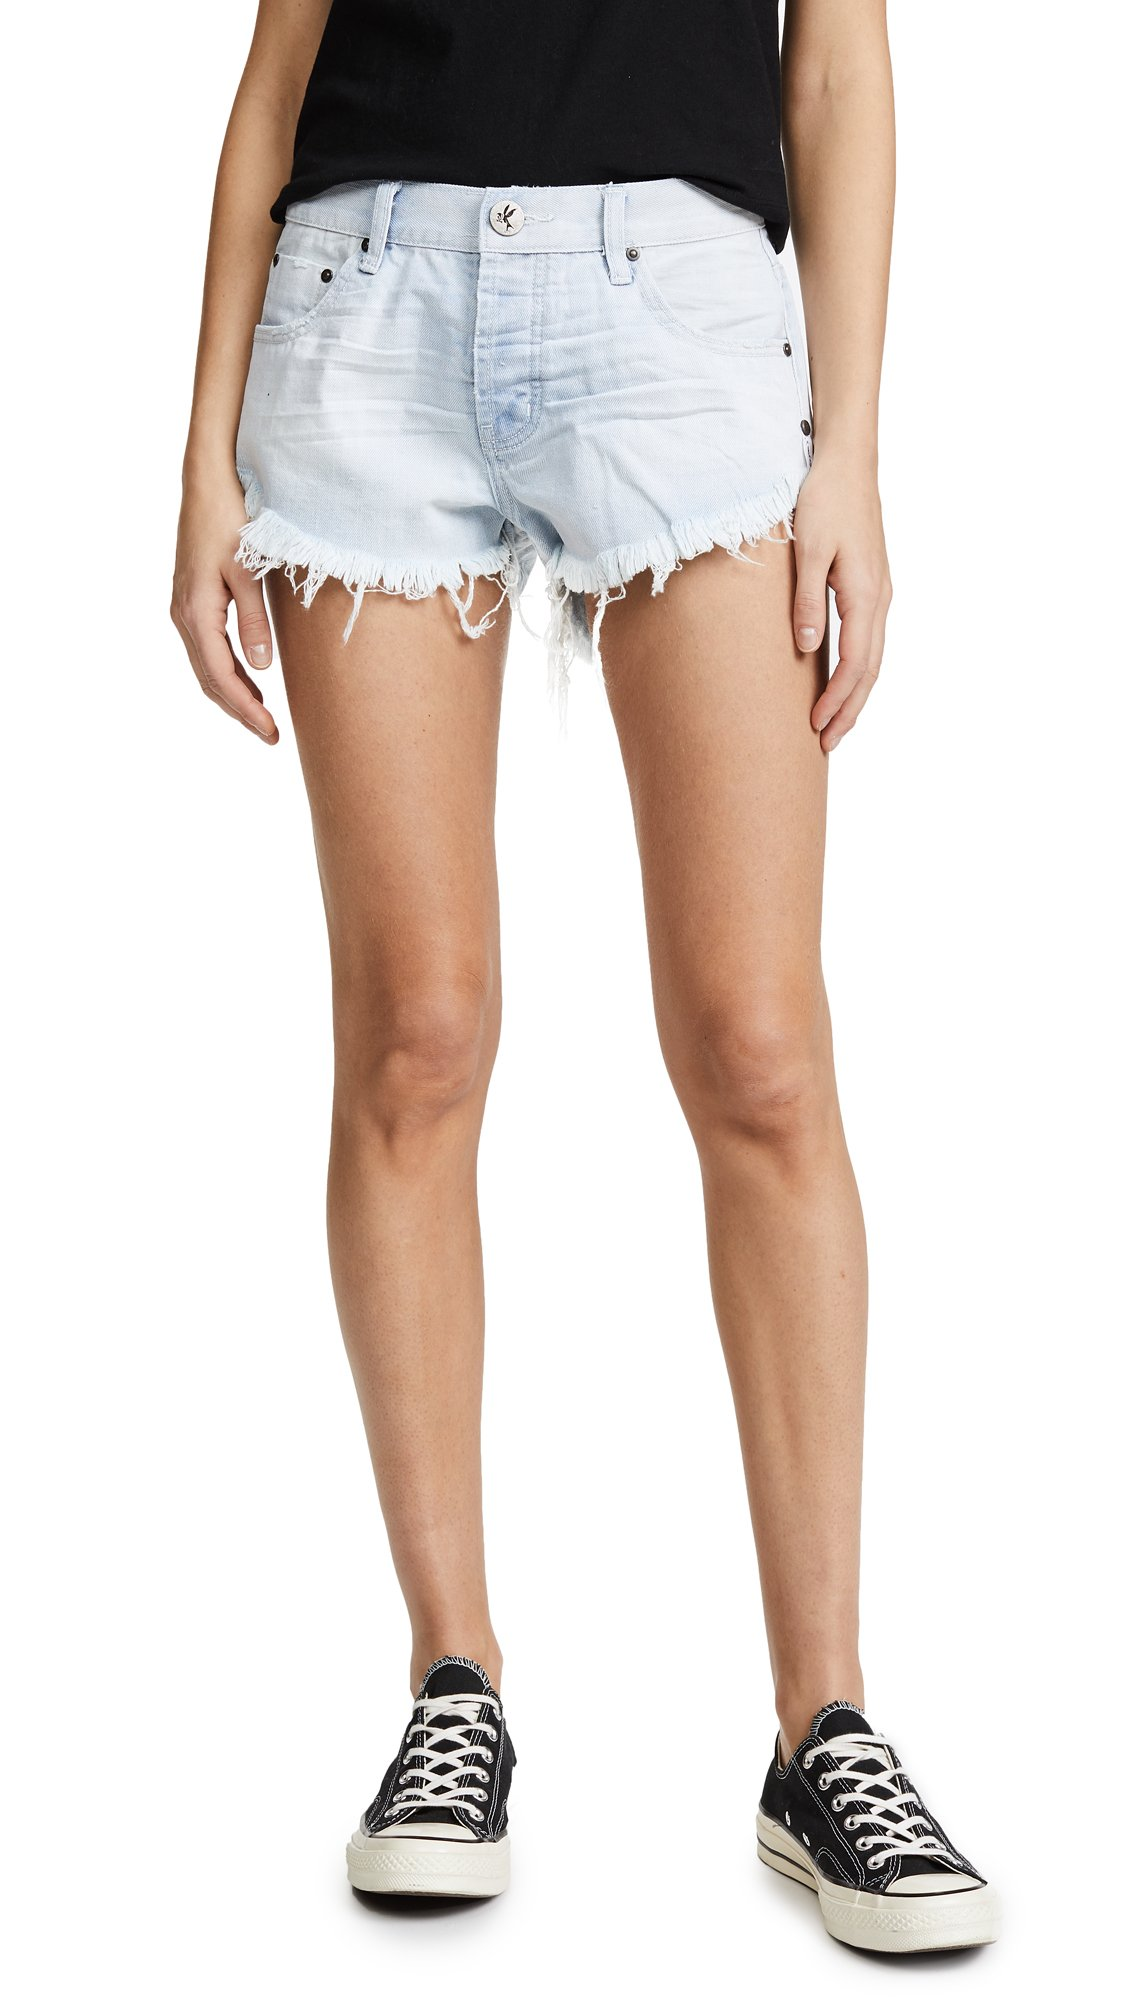 One Teaspoon Women's Relaxed Fit Brandos Shorts, Brando, 24